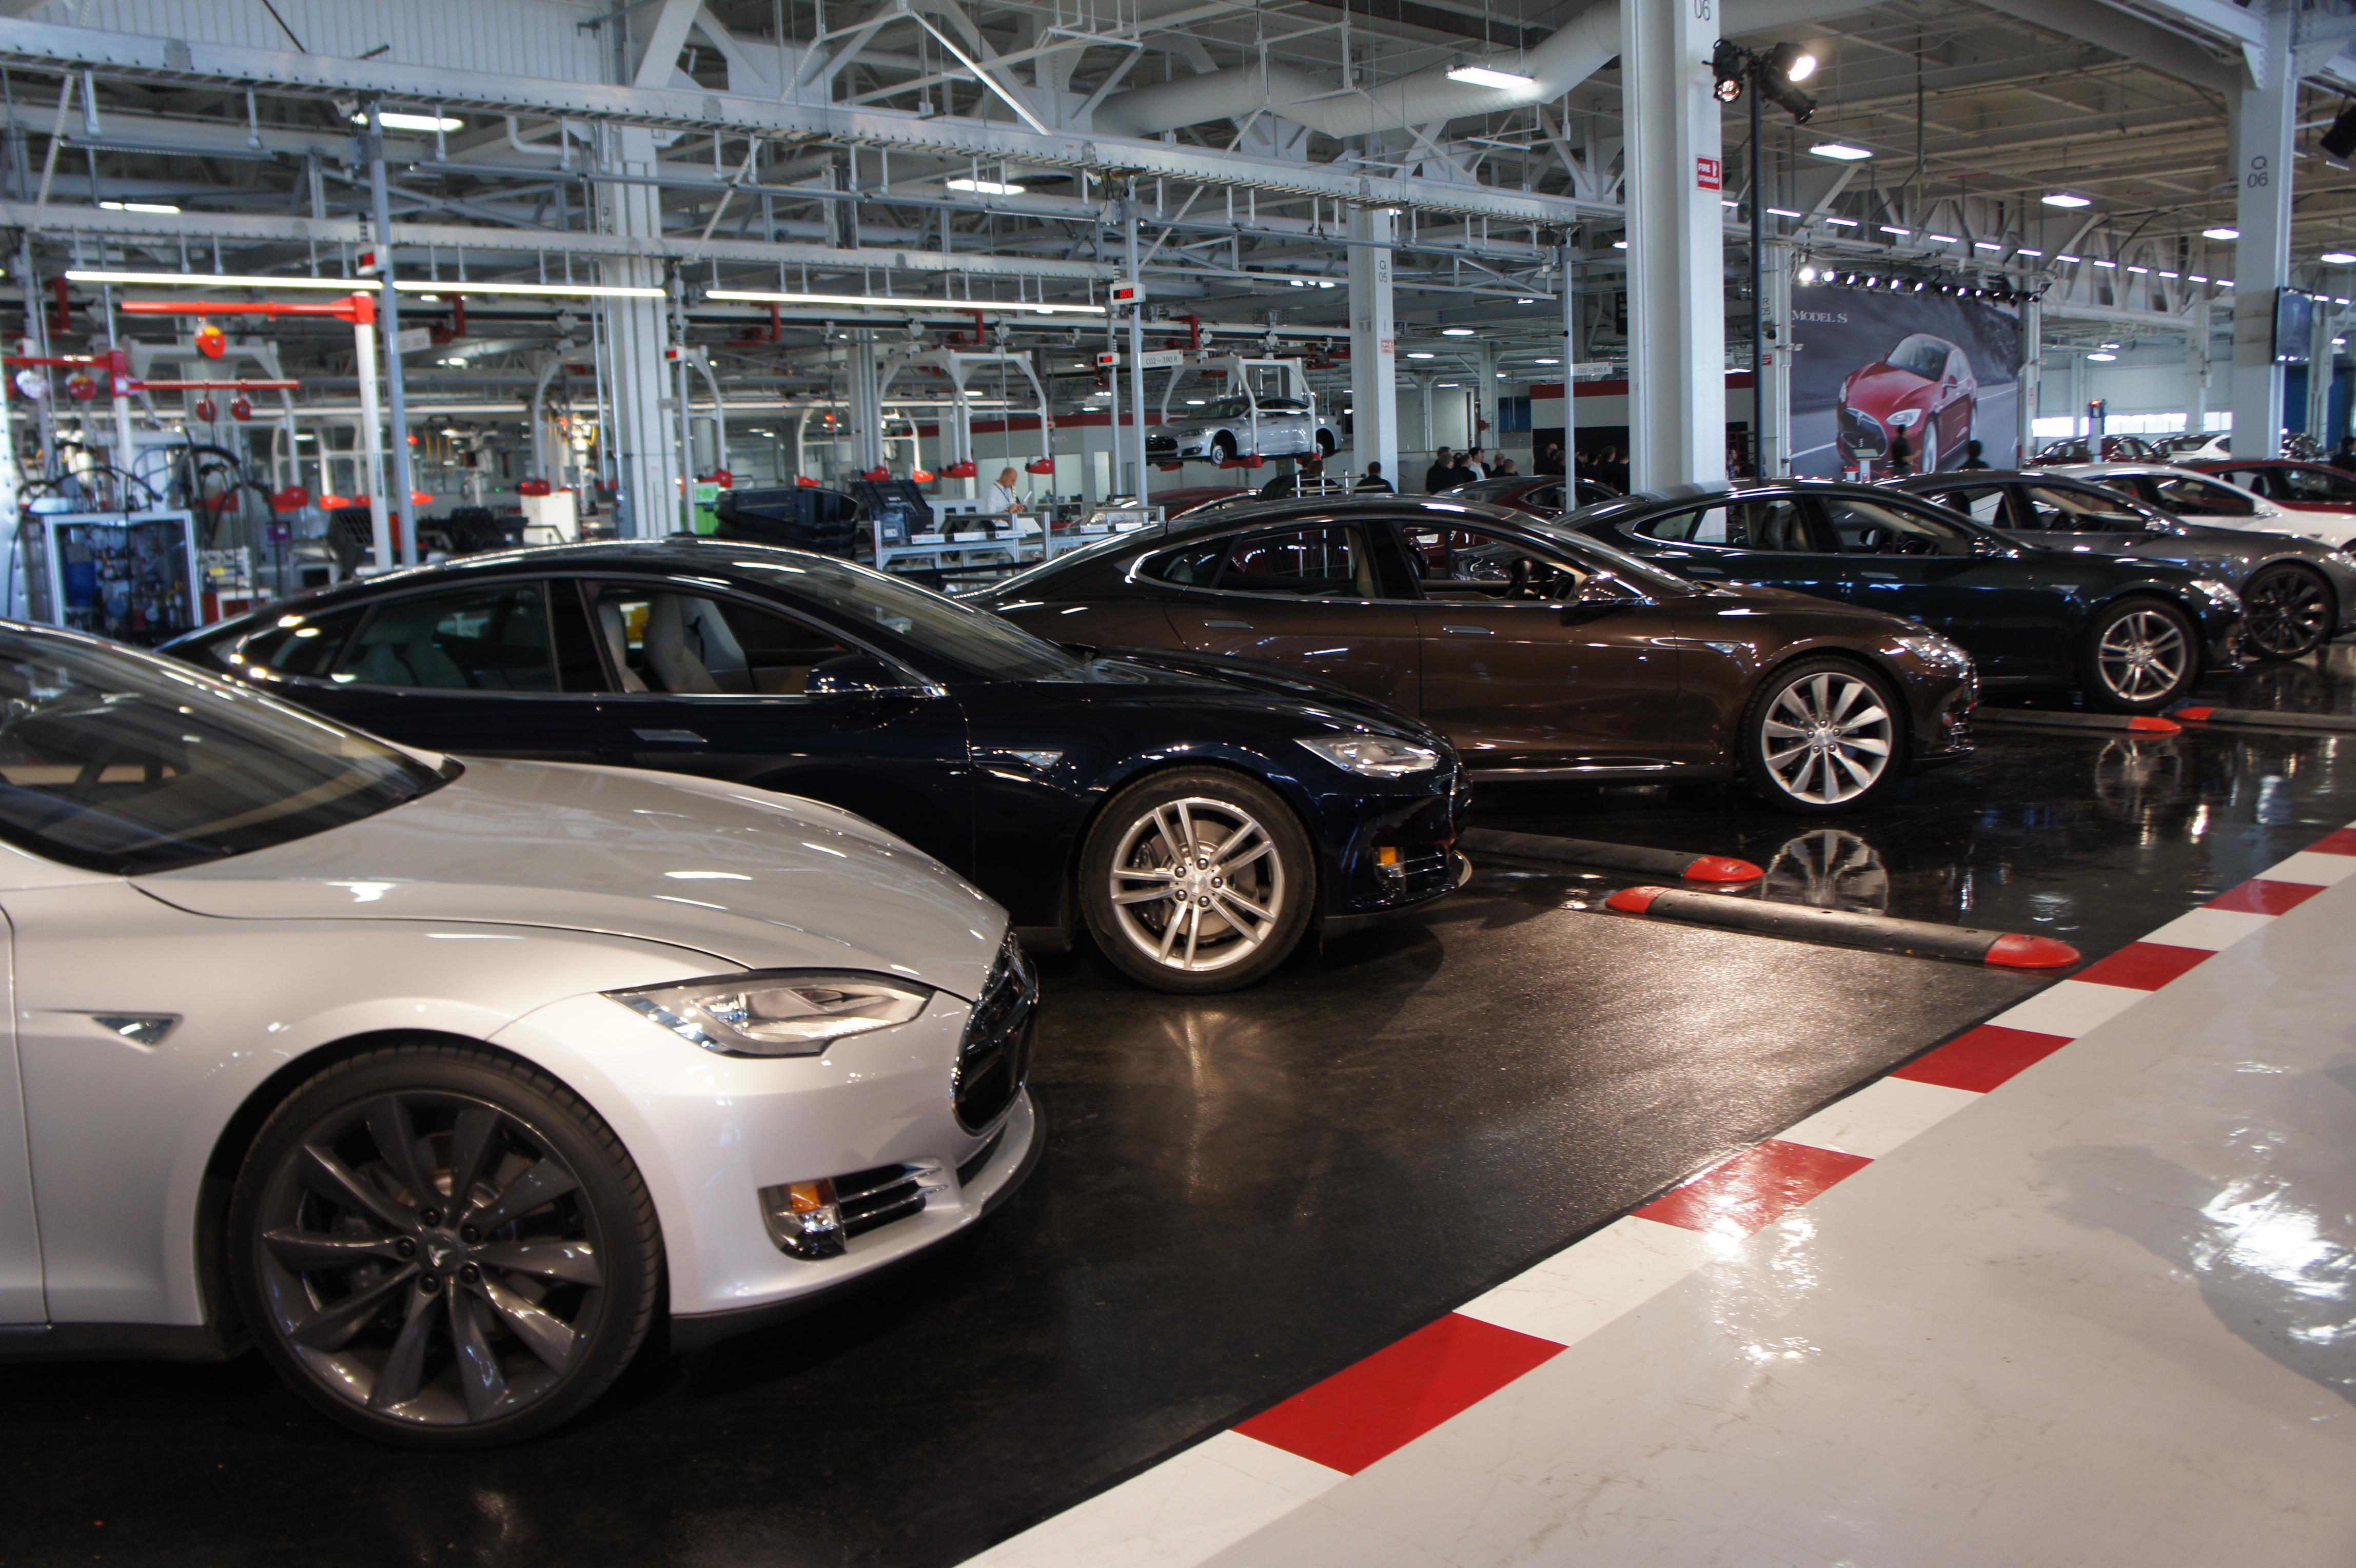 Tesla's line of Model S cars